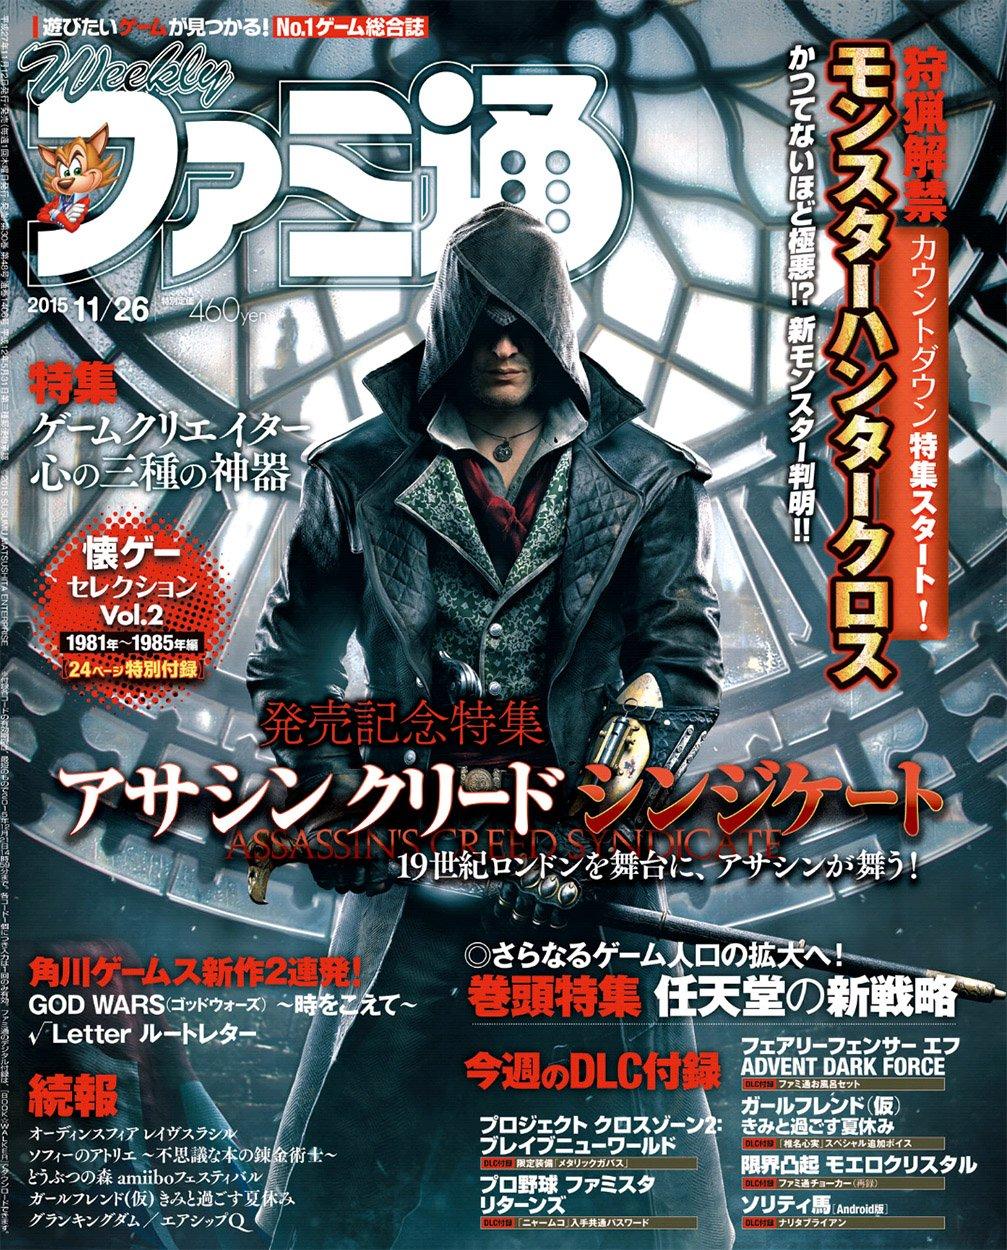 Famitsu 1406 November 26, 2015